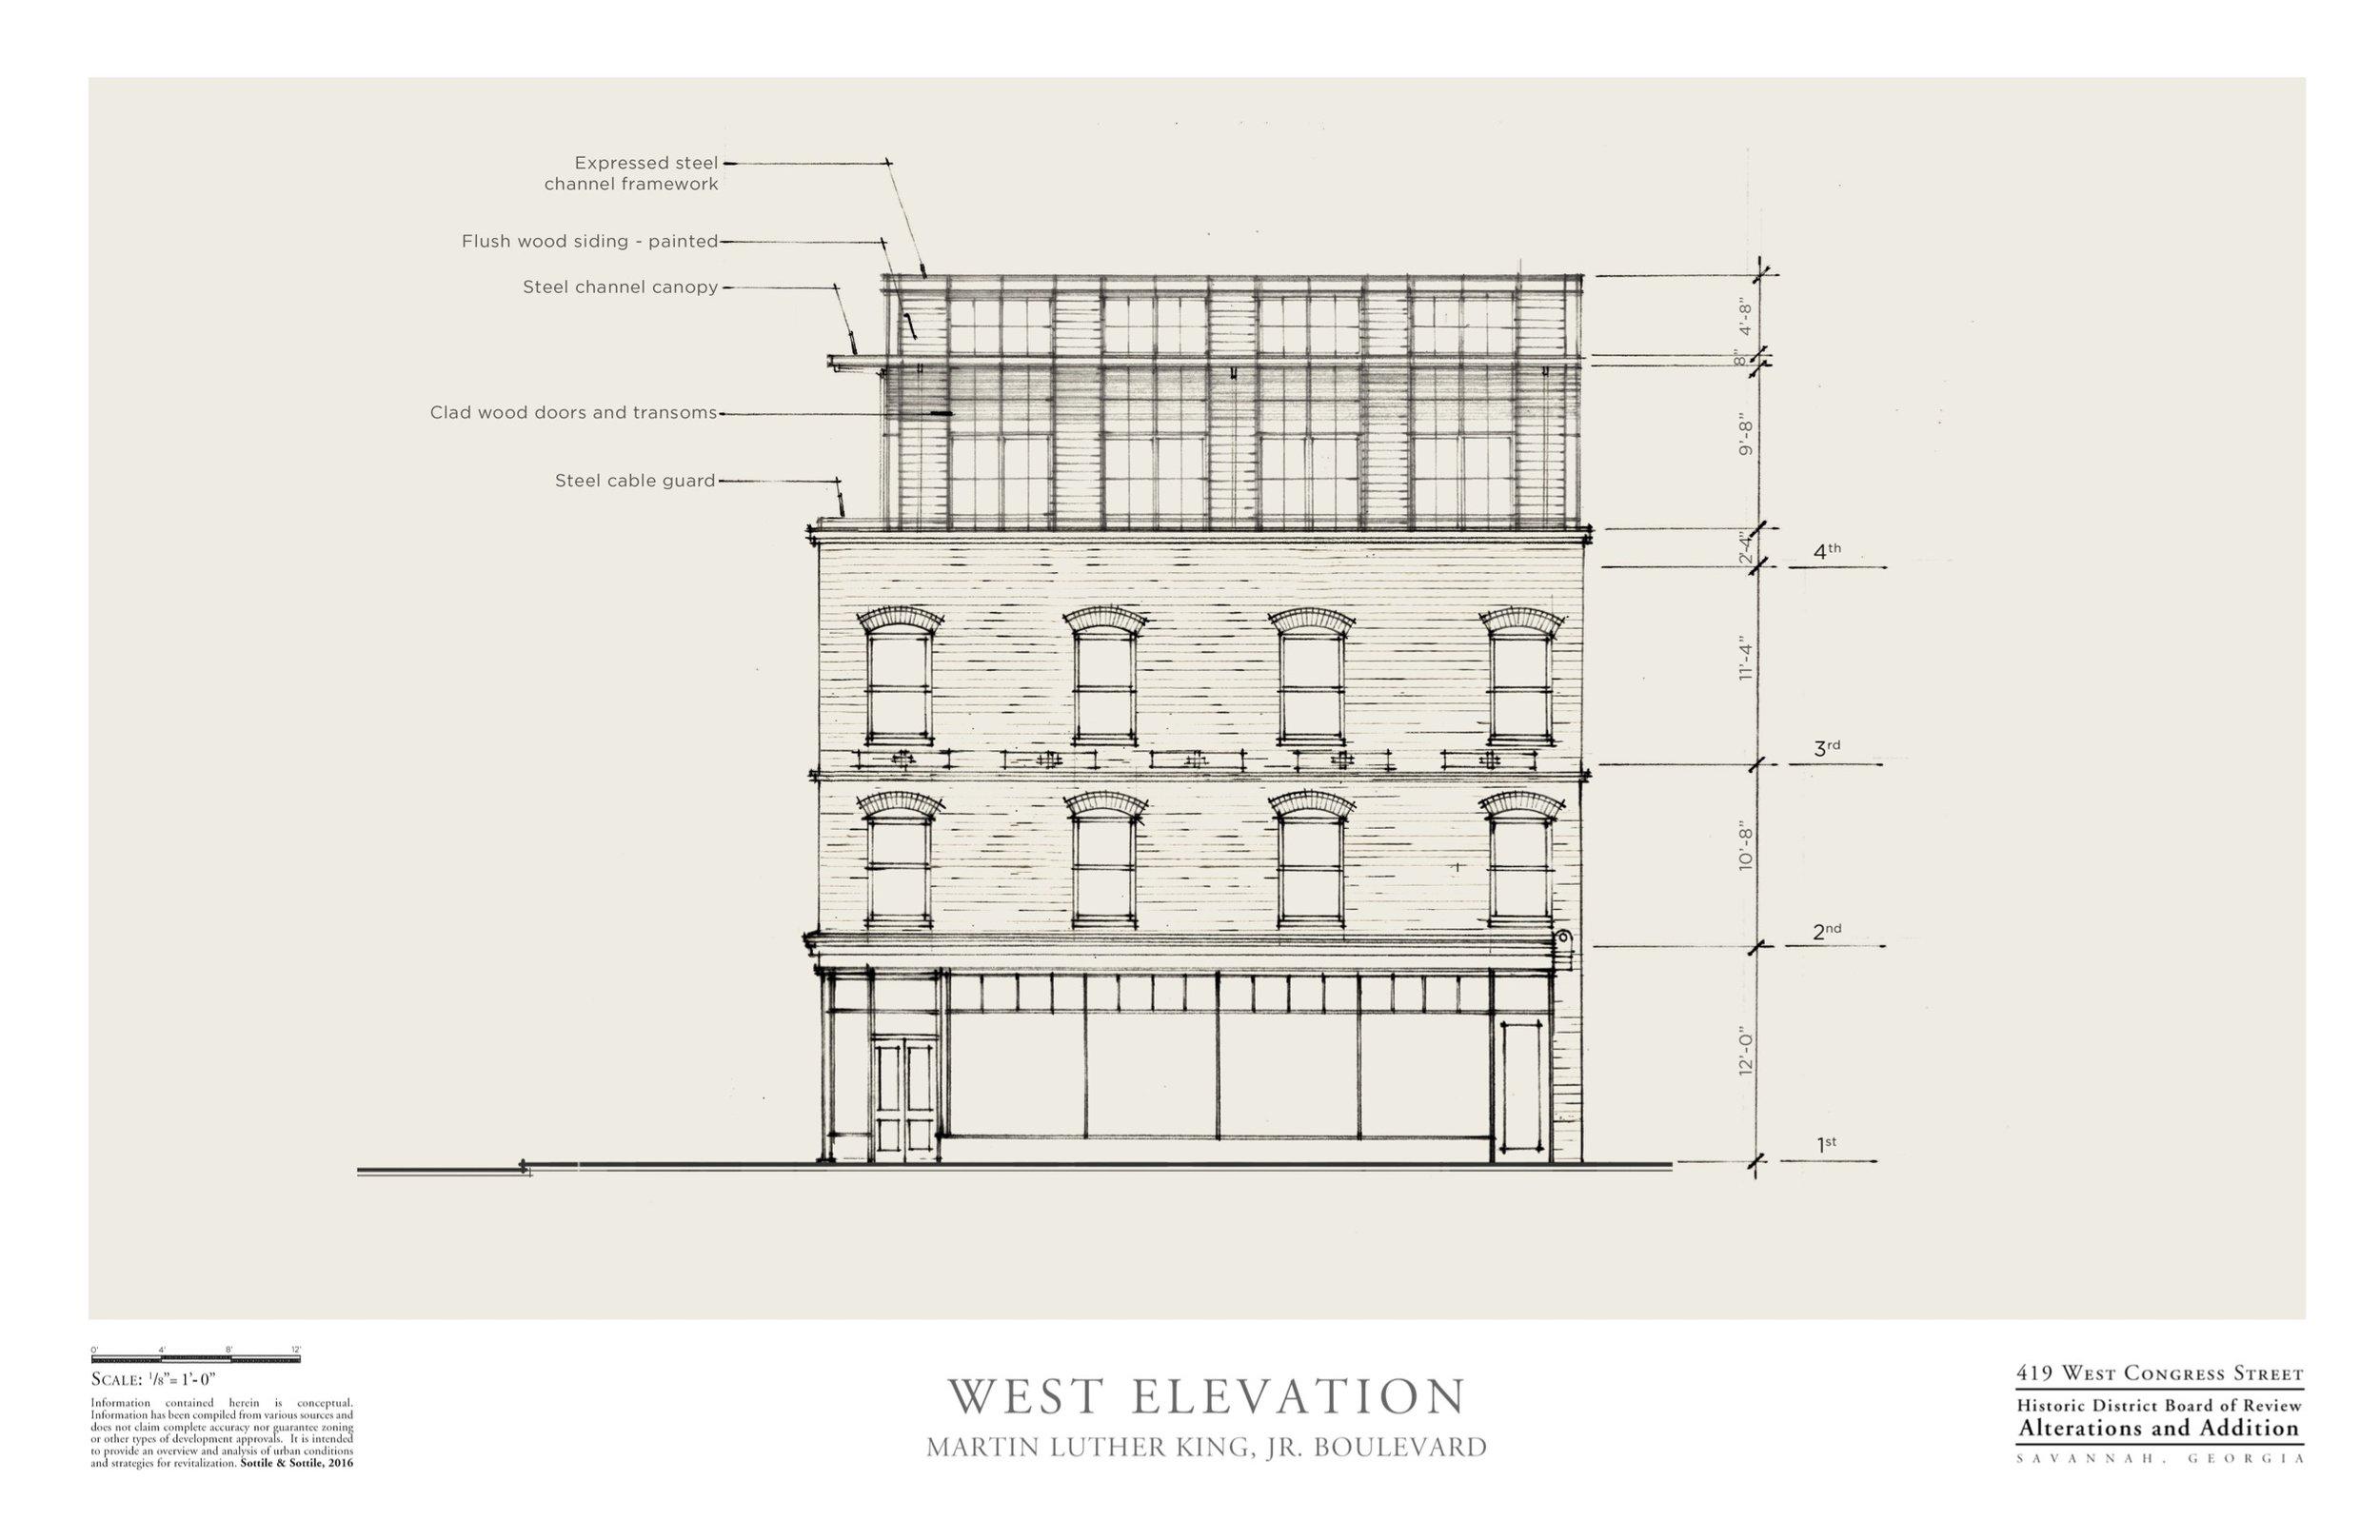 westelevation_bw.jpg